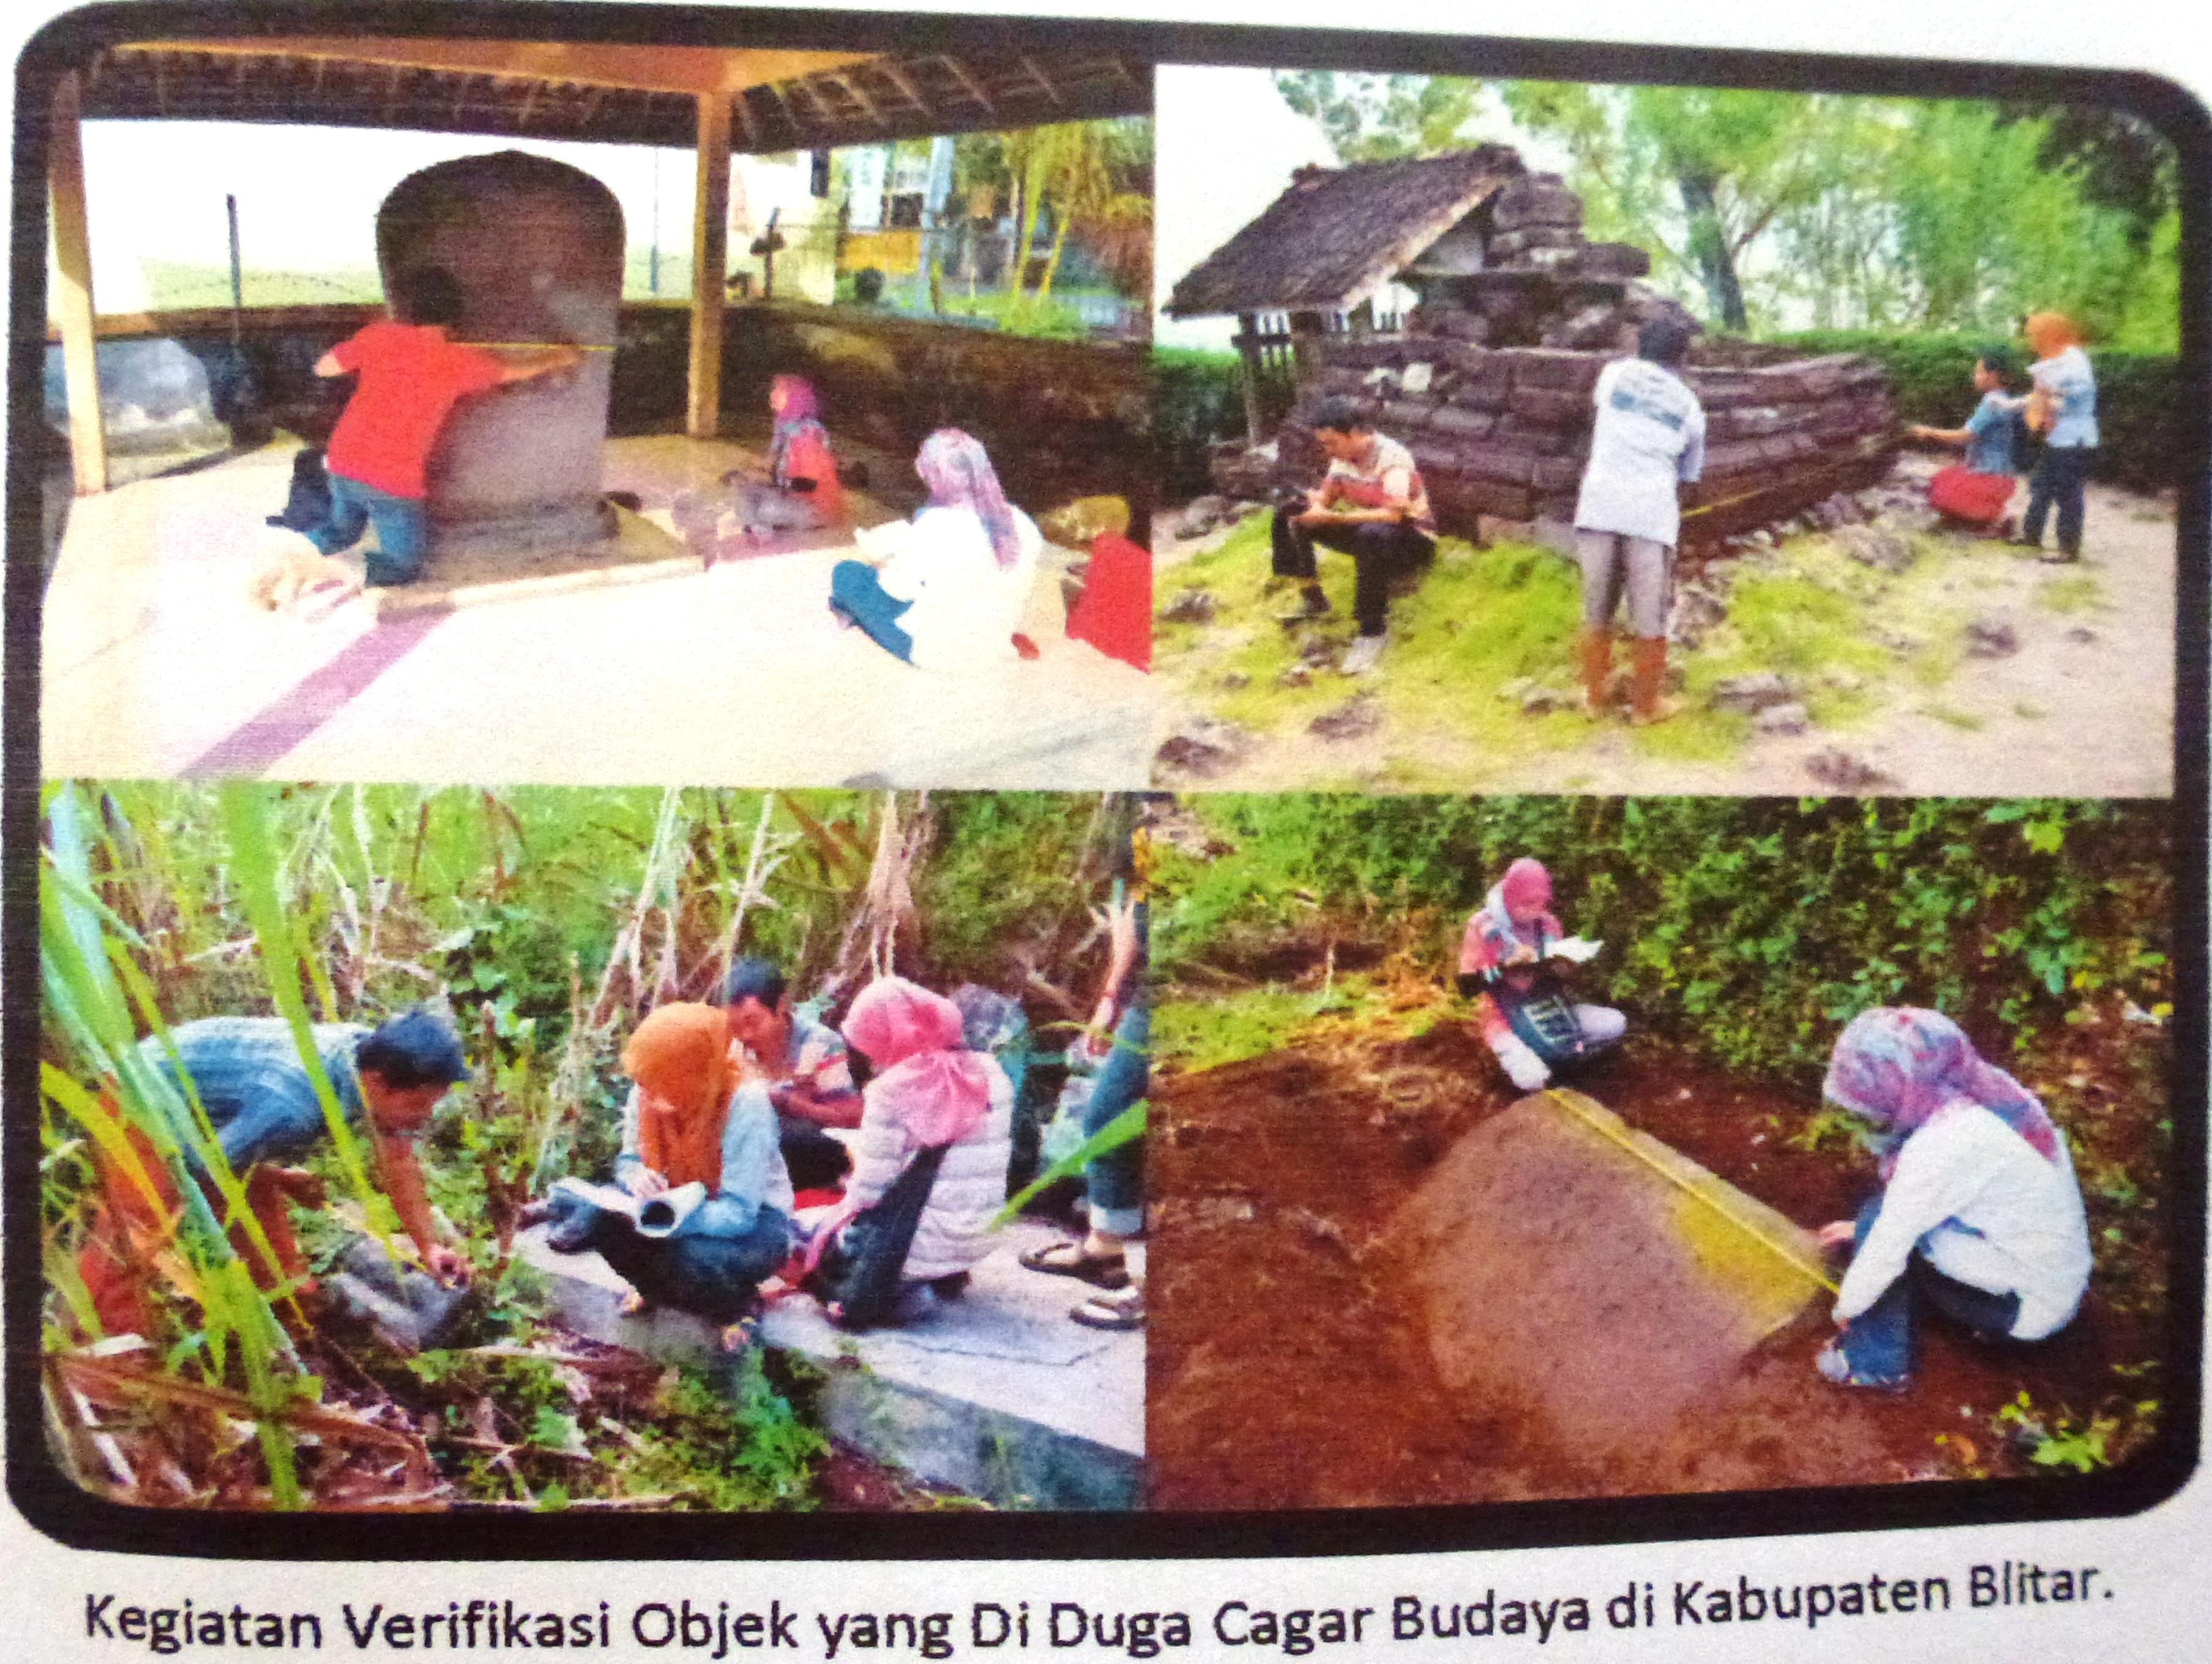 Kegiatan Bpcb Mojokerto Bulan Juni 2015 Balai Pelestarian Cagar Budaya